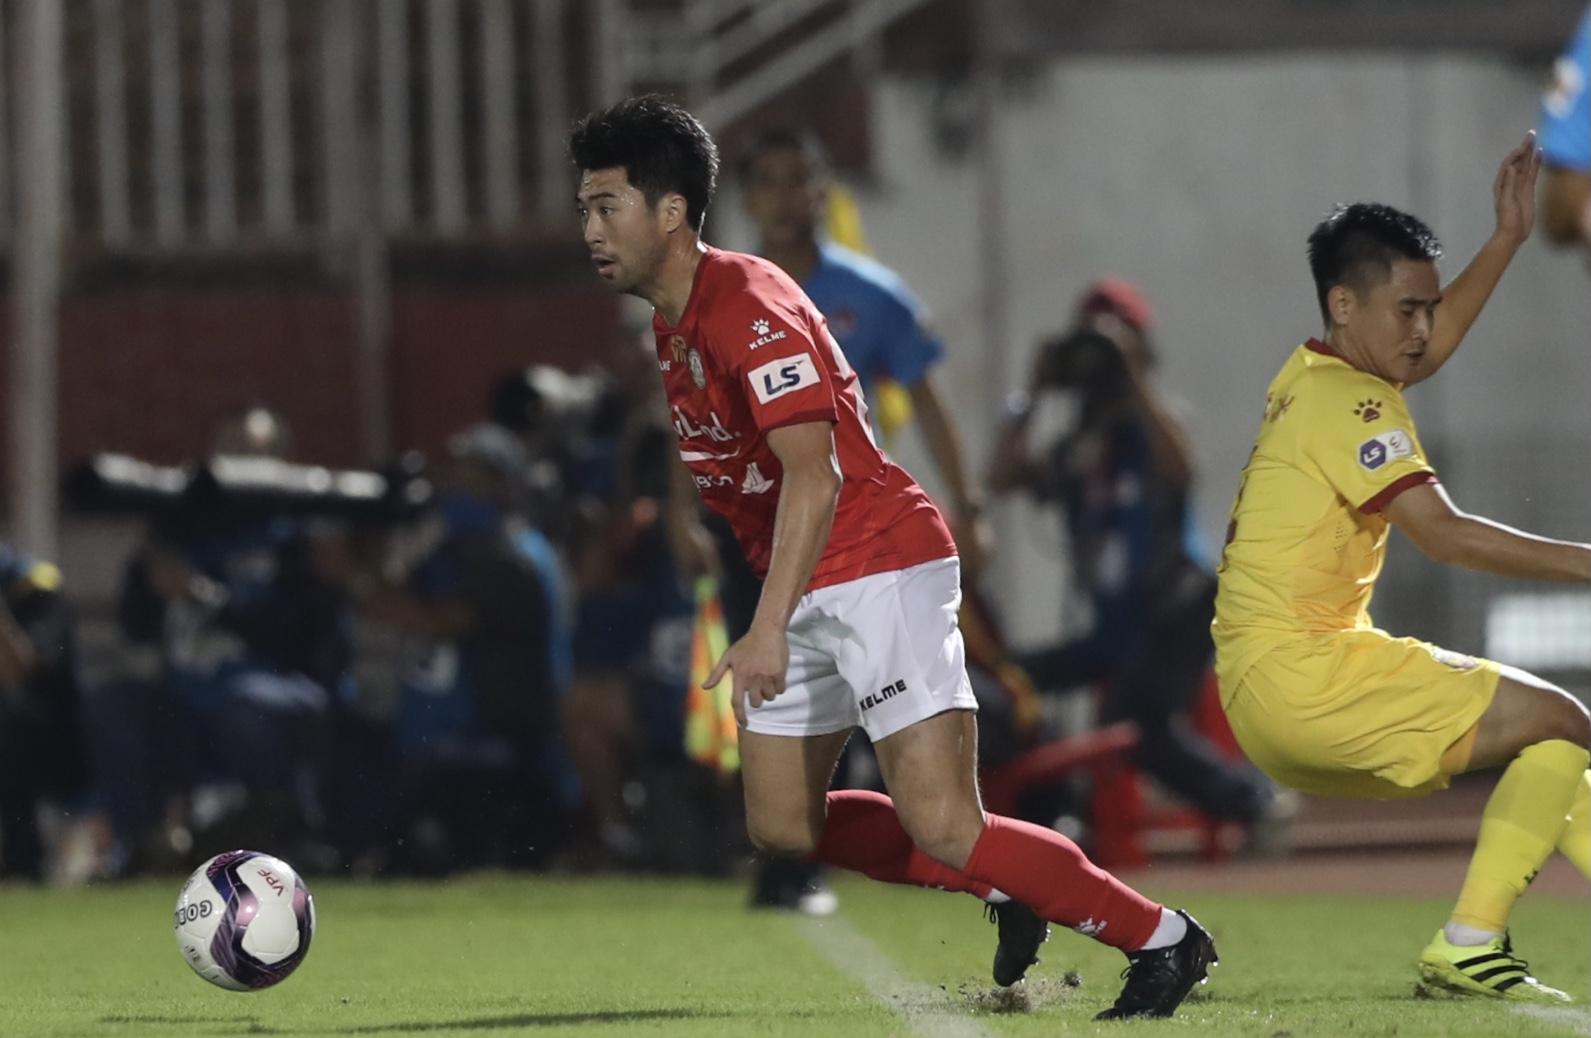 Menentukan Lee Nguyen sebagai detonator terpenting, kata Saigon FC, ada cara untuk menetralkan pemain ini.  Foto: Duc Dong.